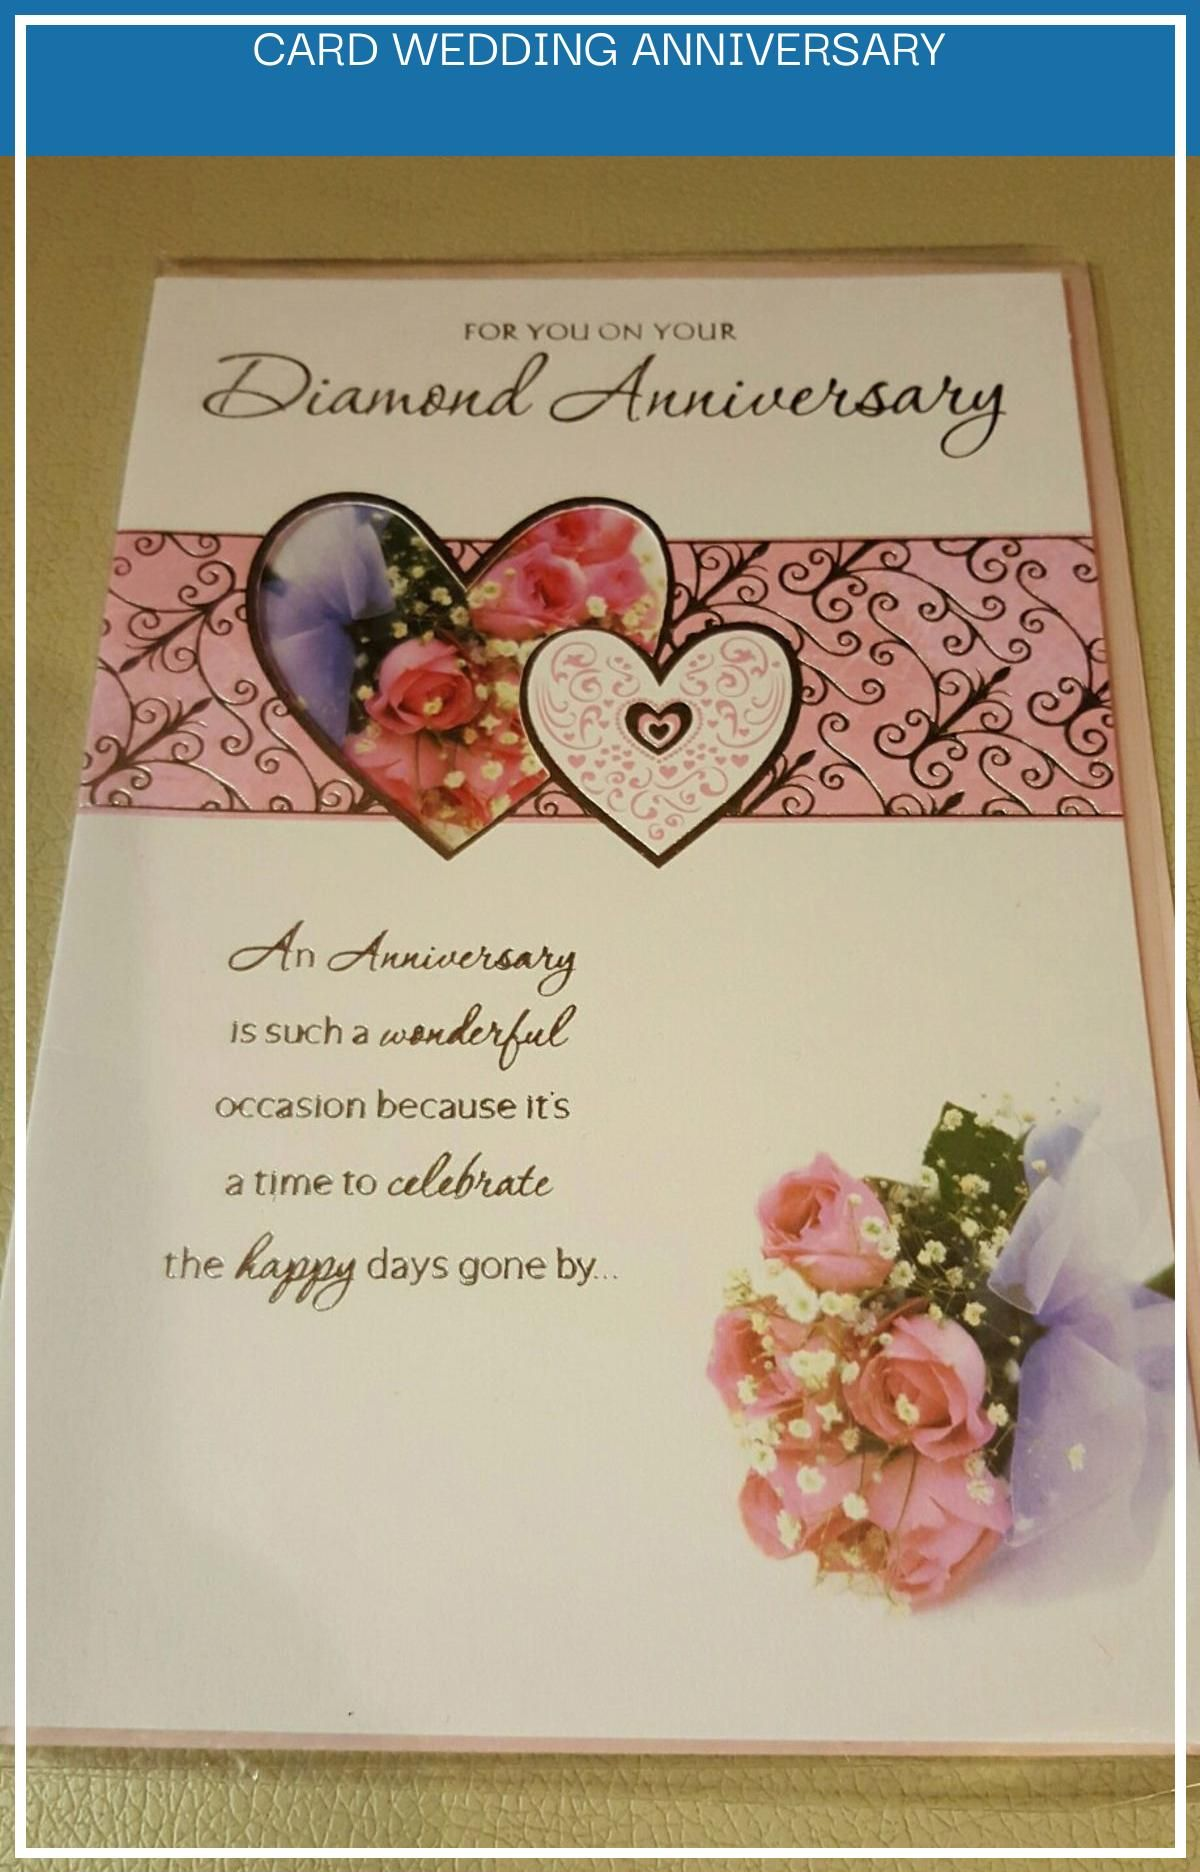 14 Best Card Wedding Anniversary Diamond Wedding Anniversary Cards Anniversary Photo Cards Wedding Anniversary Cards